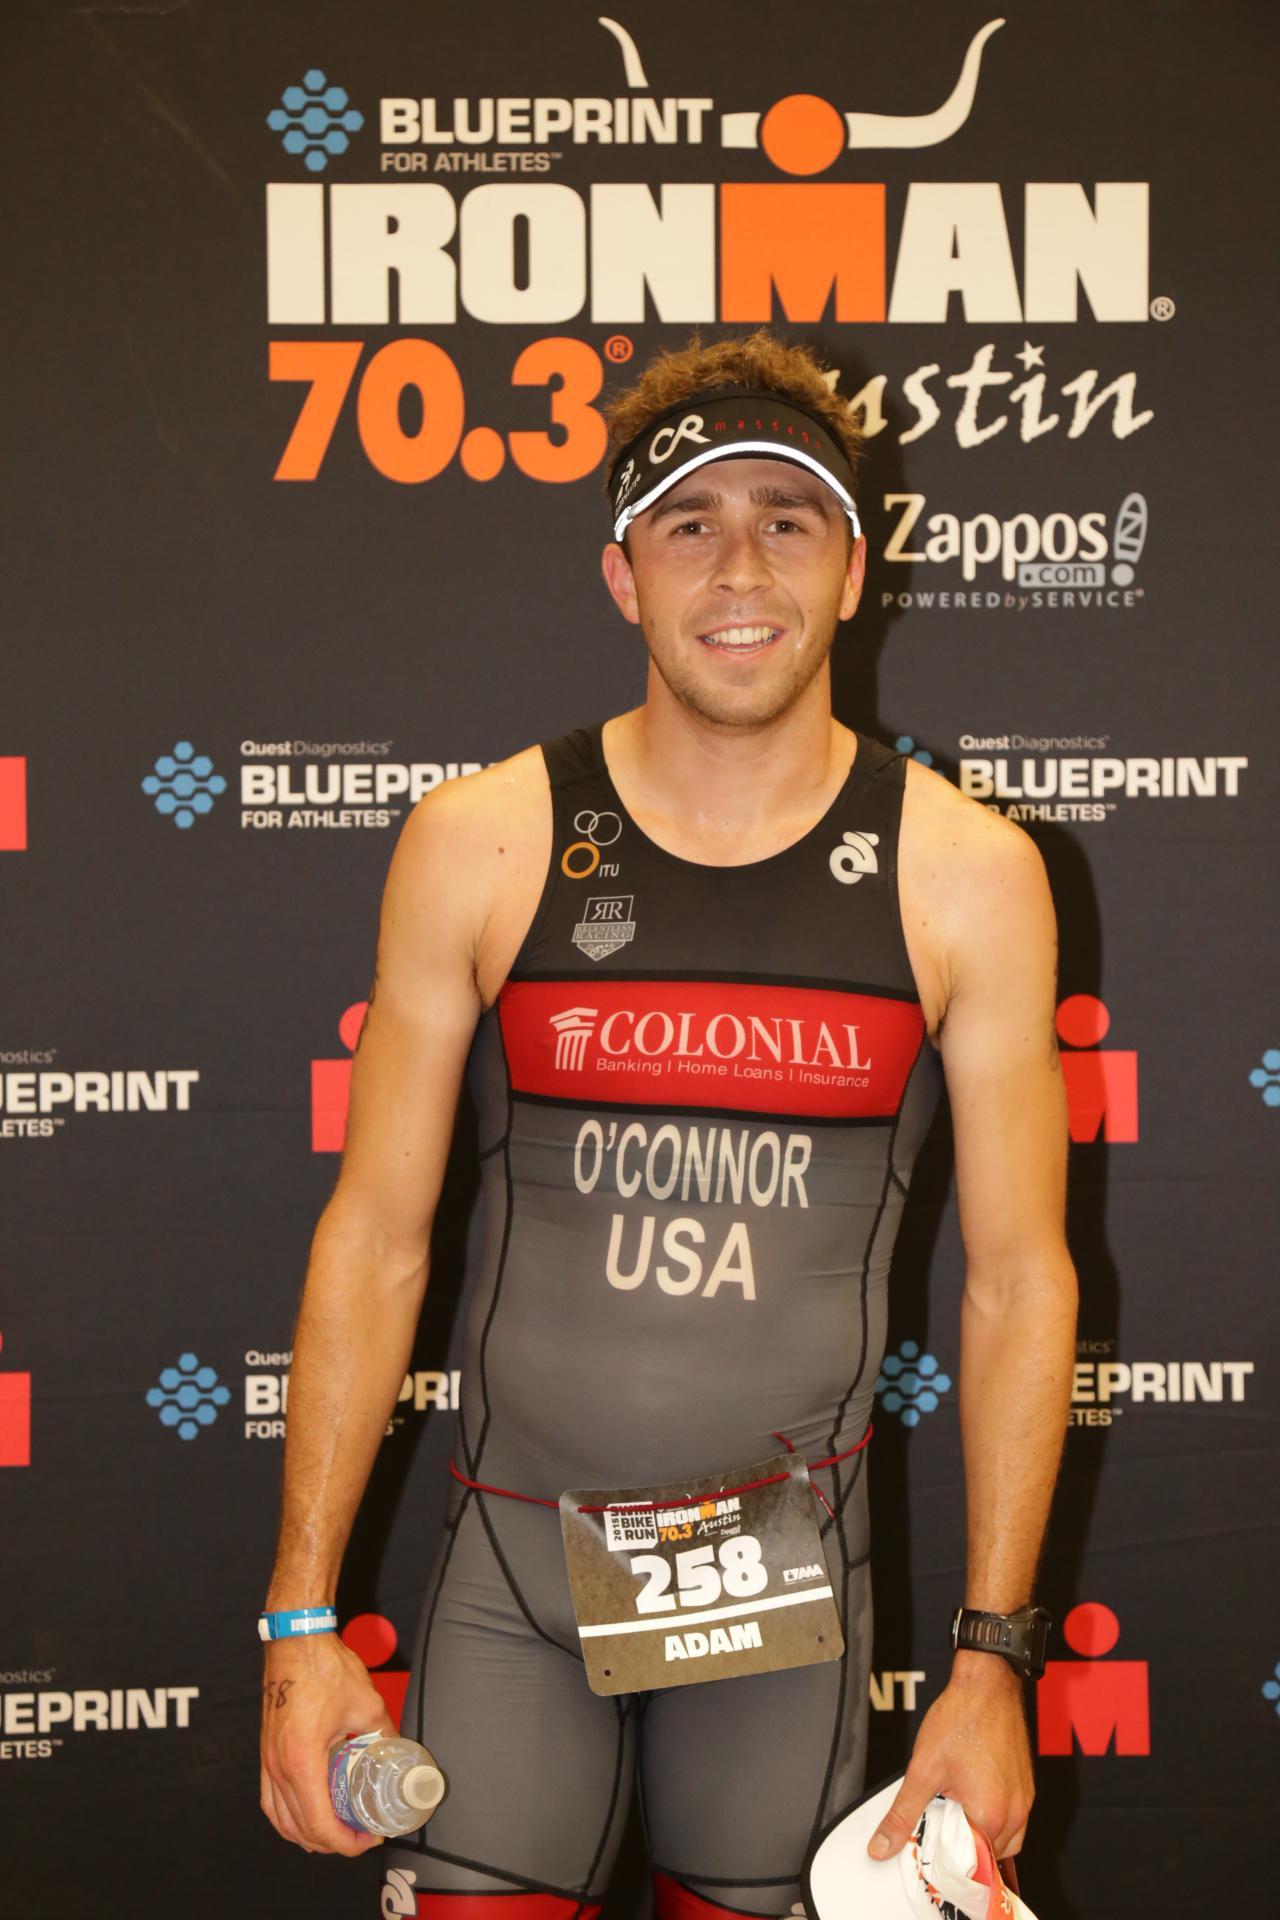 2015 Ironman Austin 70.3